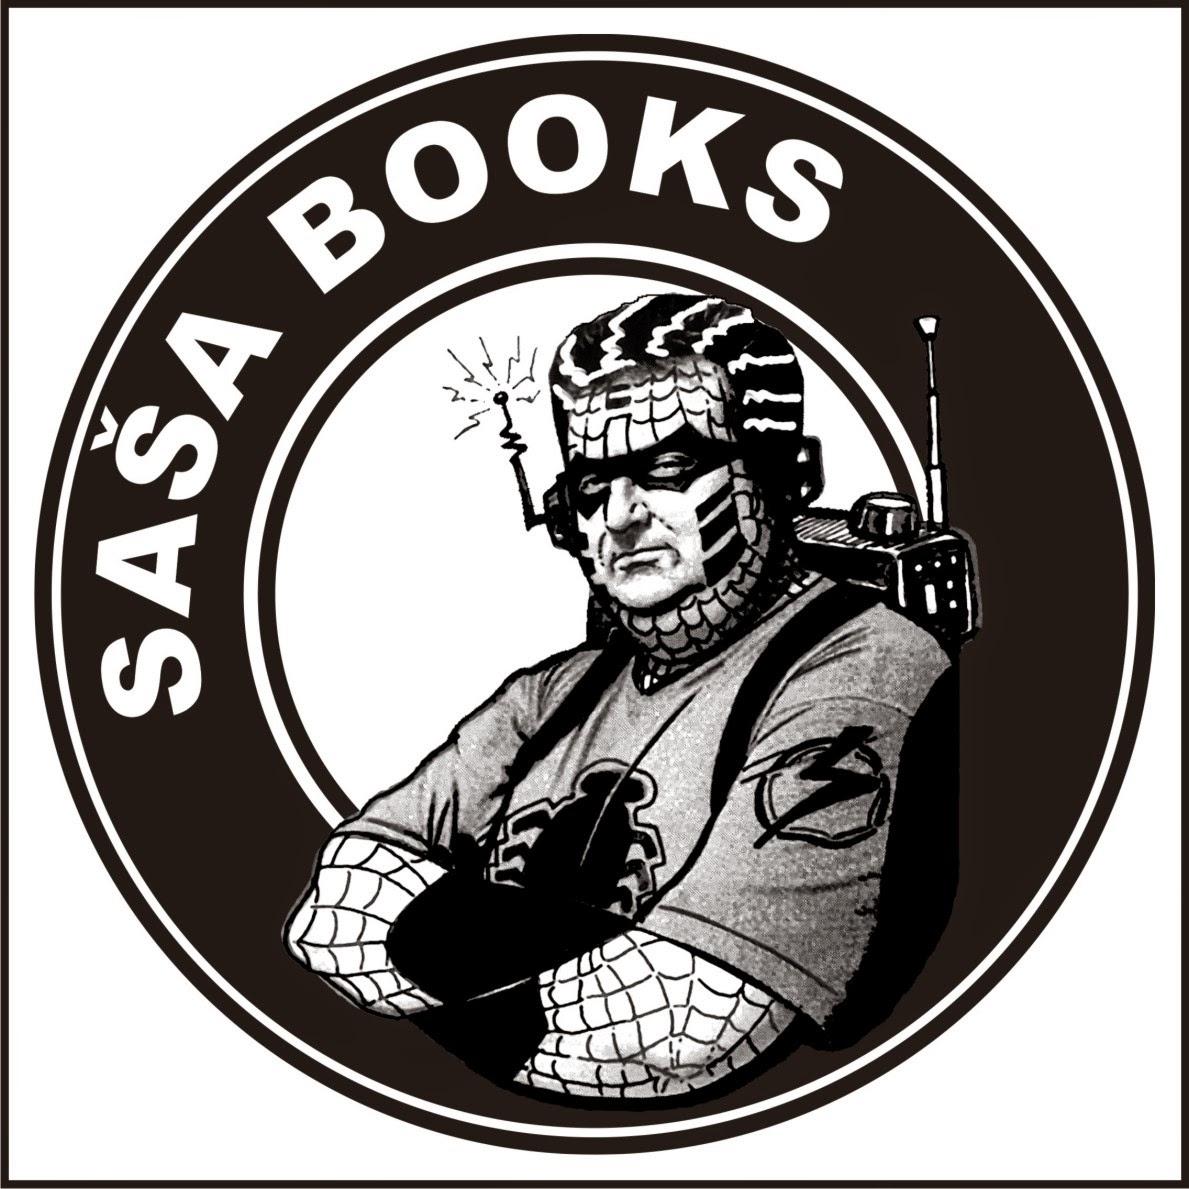 SASA BOOKS